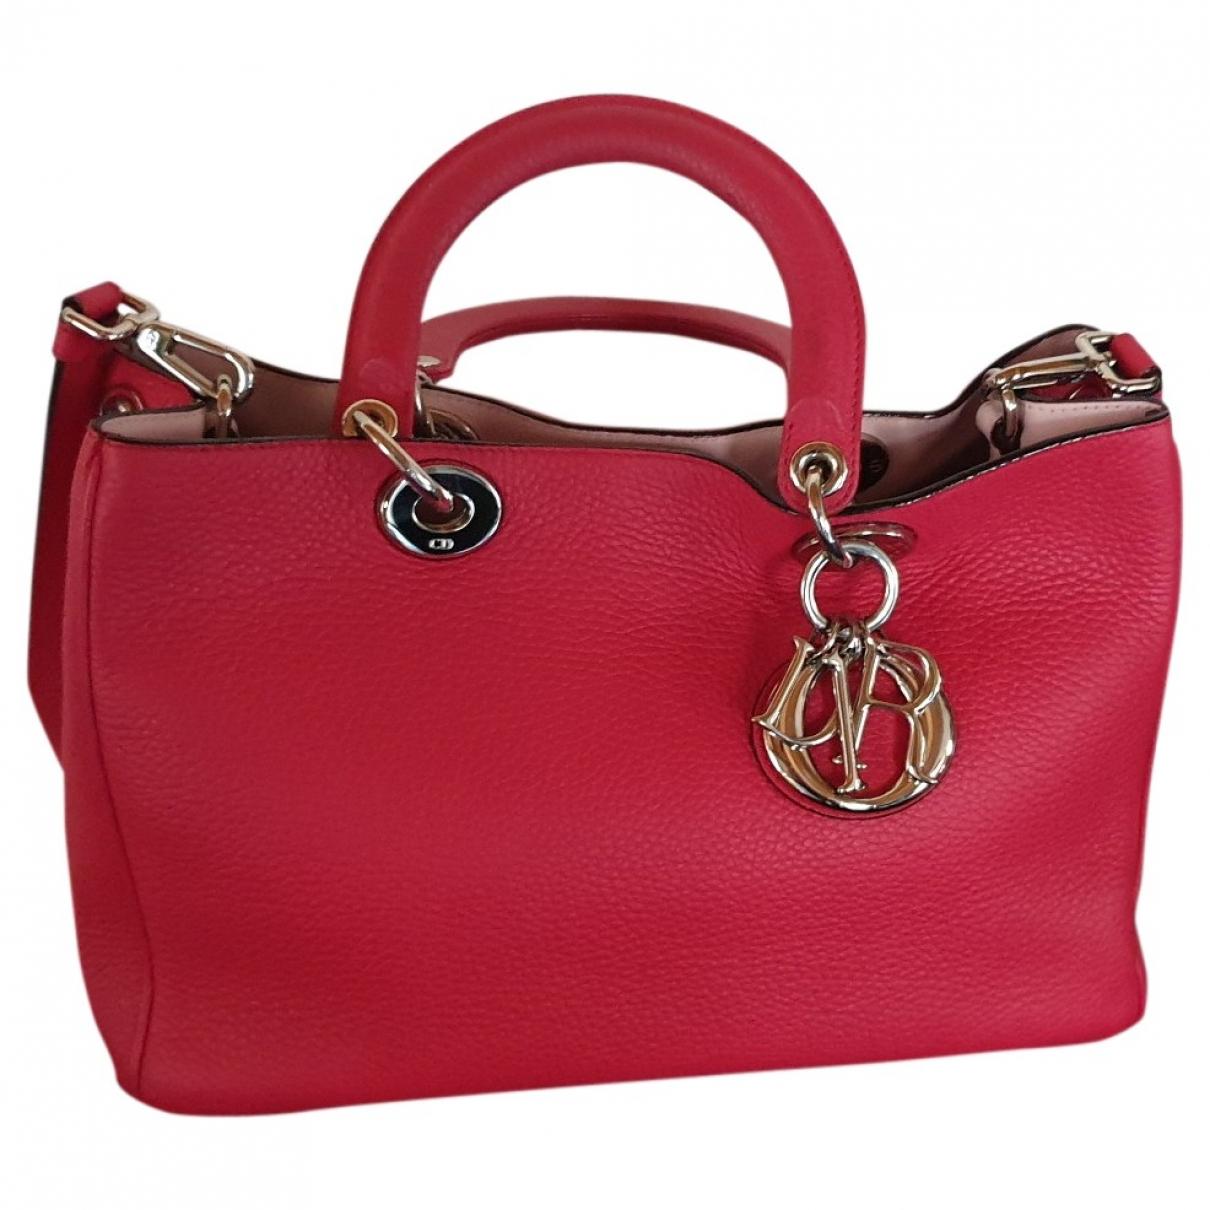 Dior Diorissimo Pink Leather handbag for Women \N